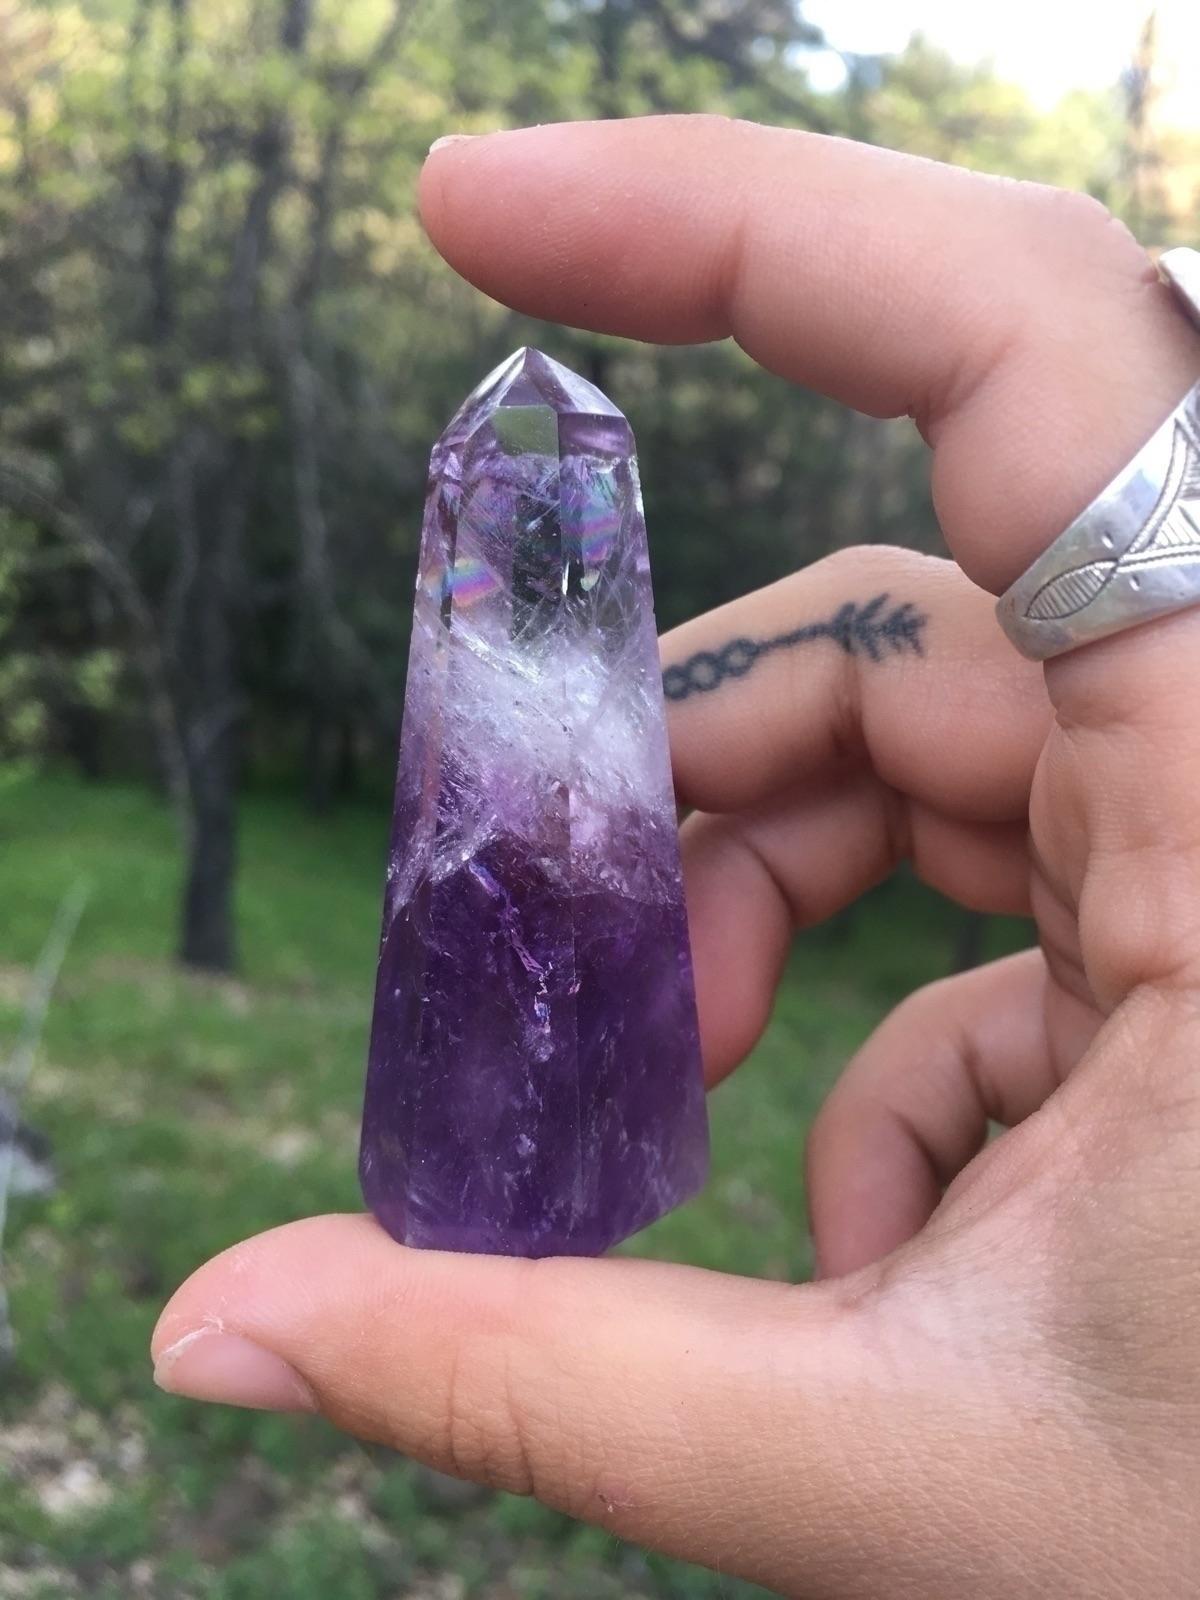 Rainbow filled Amethyst crystal - belovedminerals | ello